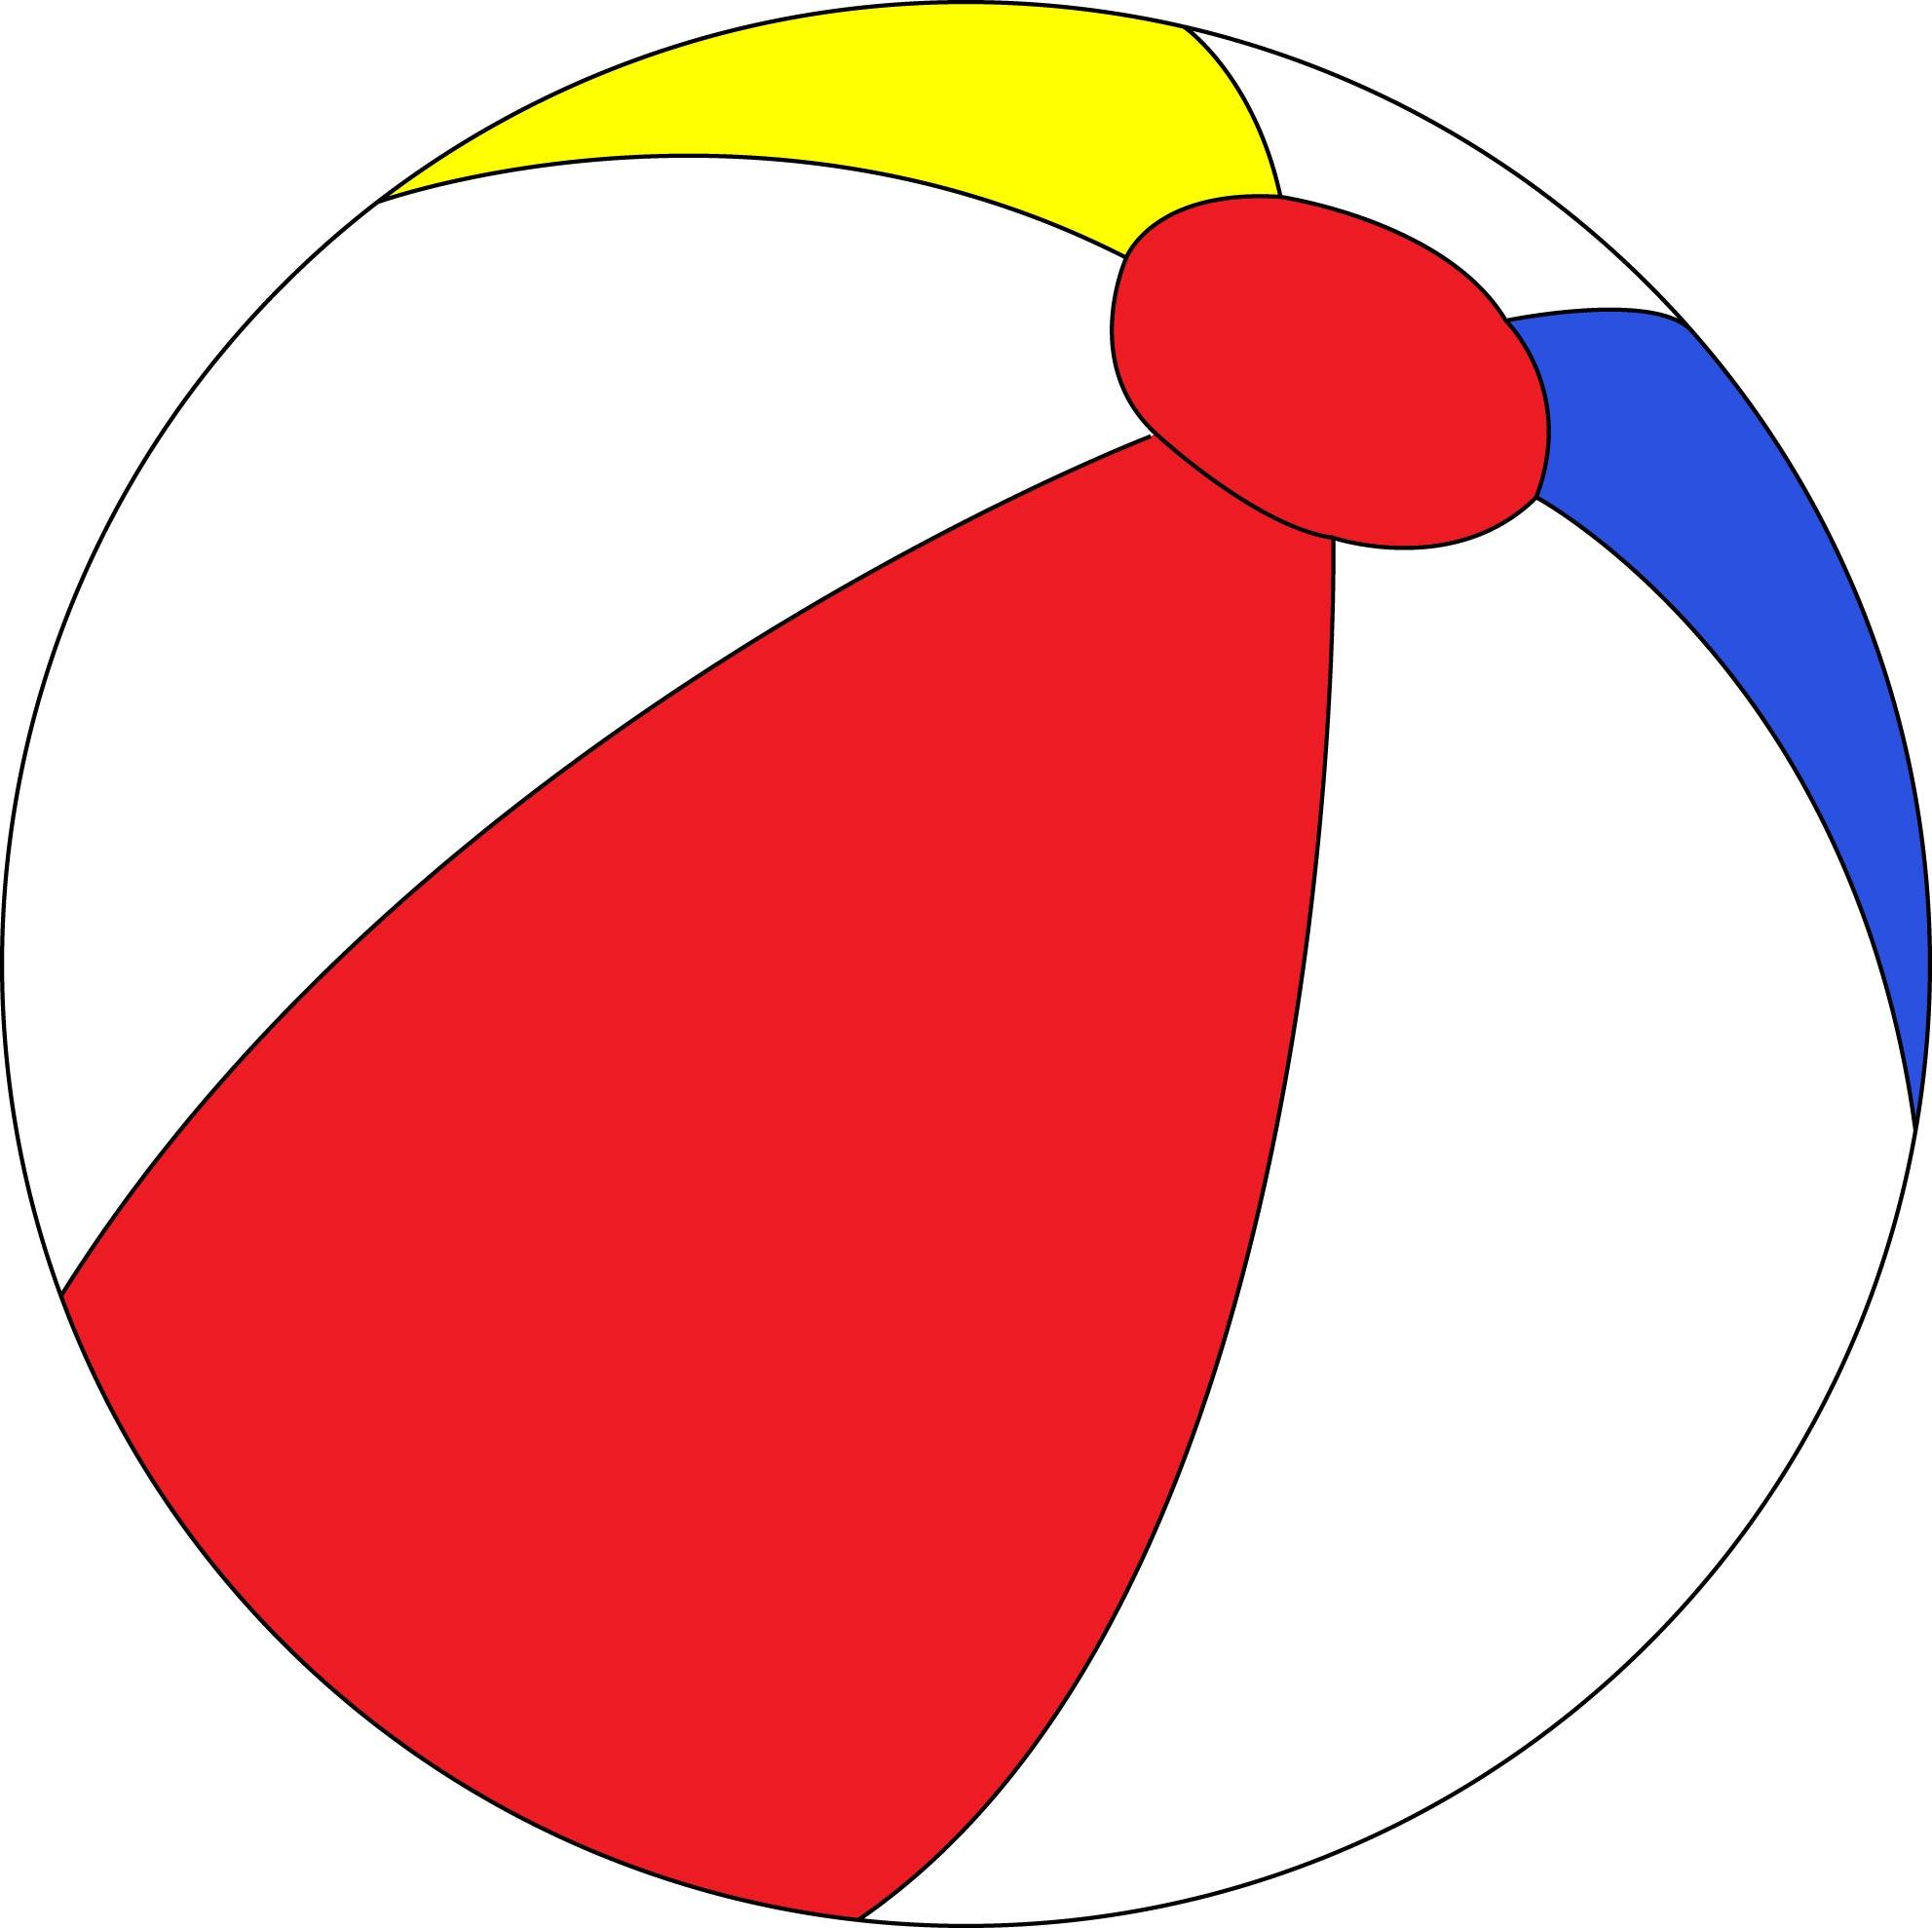 1983x1979 Animated Beach Ball Using Adobe Illustrator, Flash Volunteering